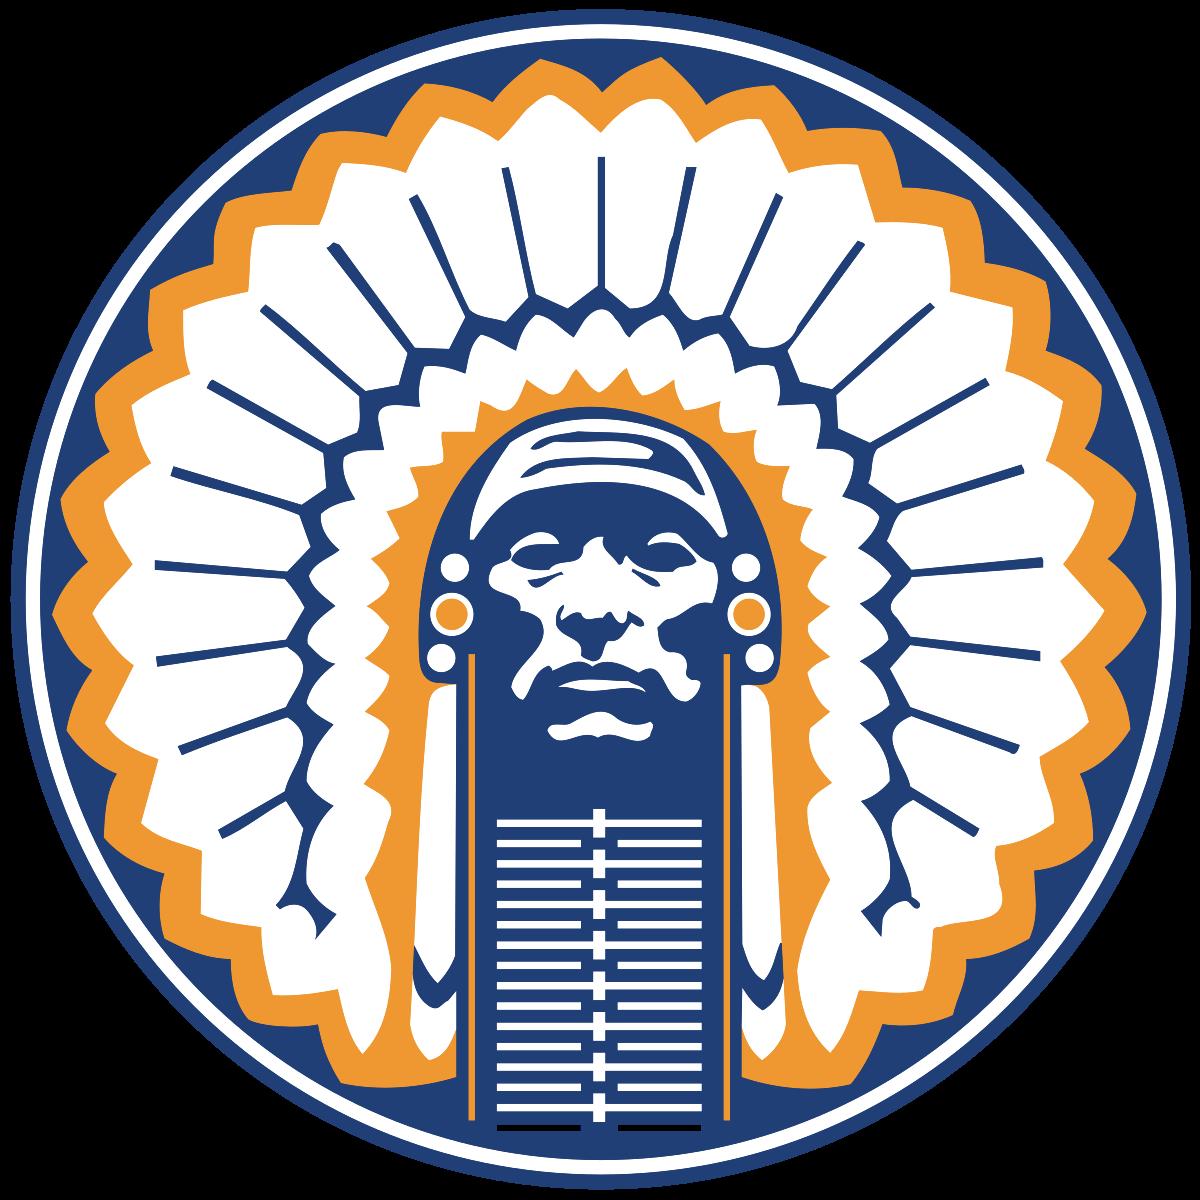 Indian football mascot clipart graphic transparent stock Chief Illiniwek - Wikipedia graphic transparent stock